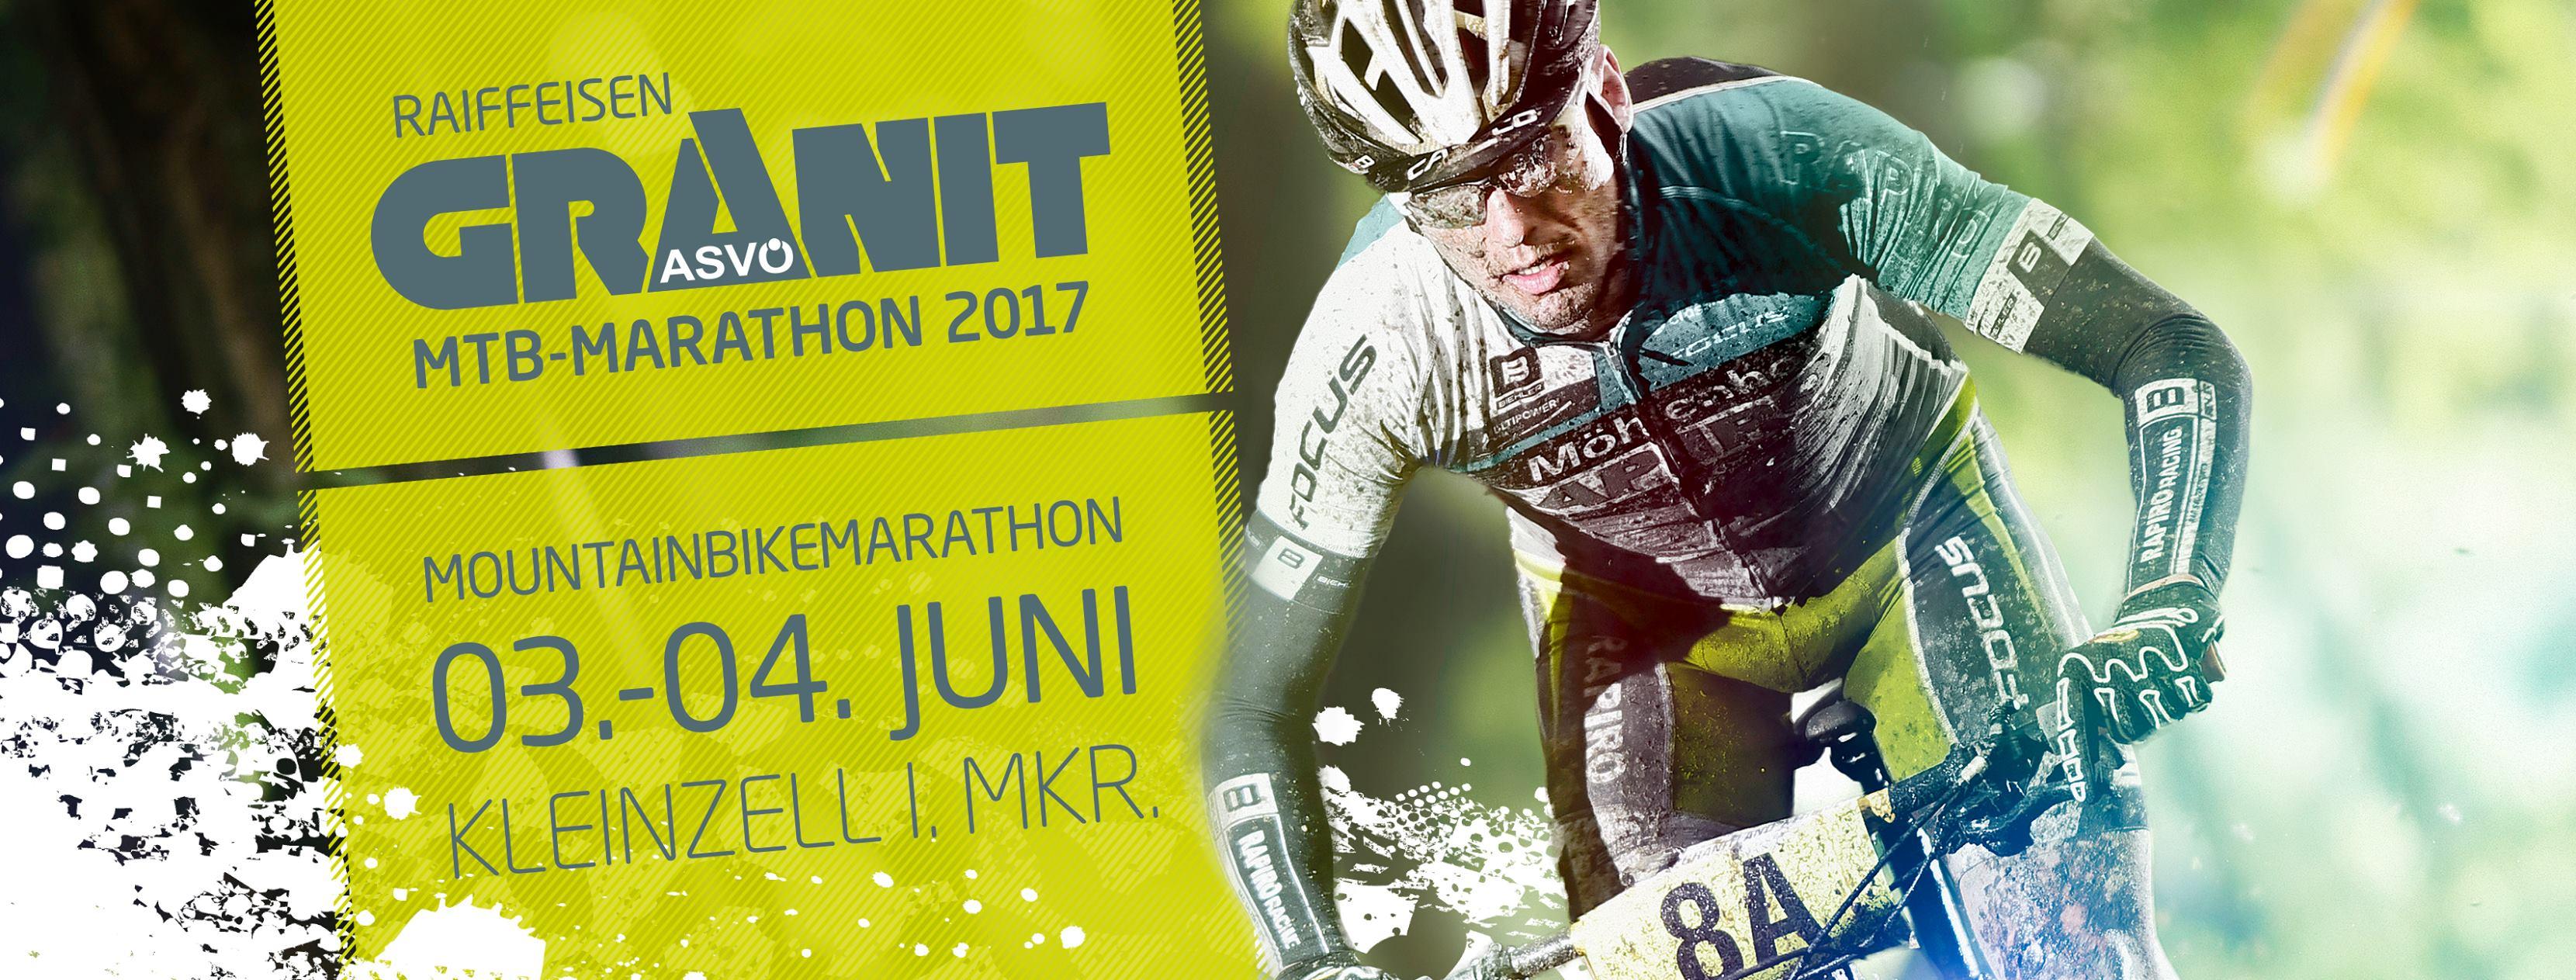 Granitmarathon